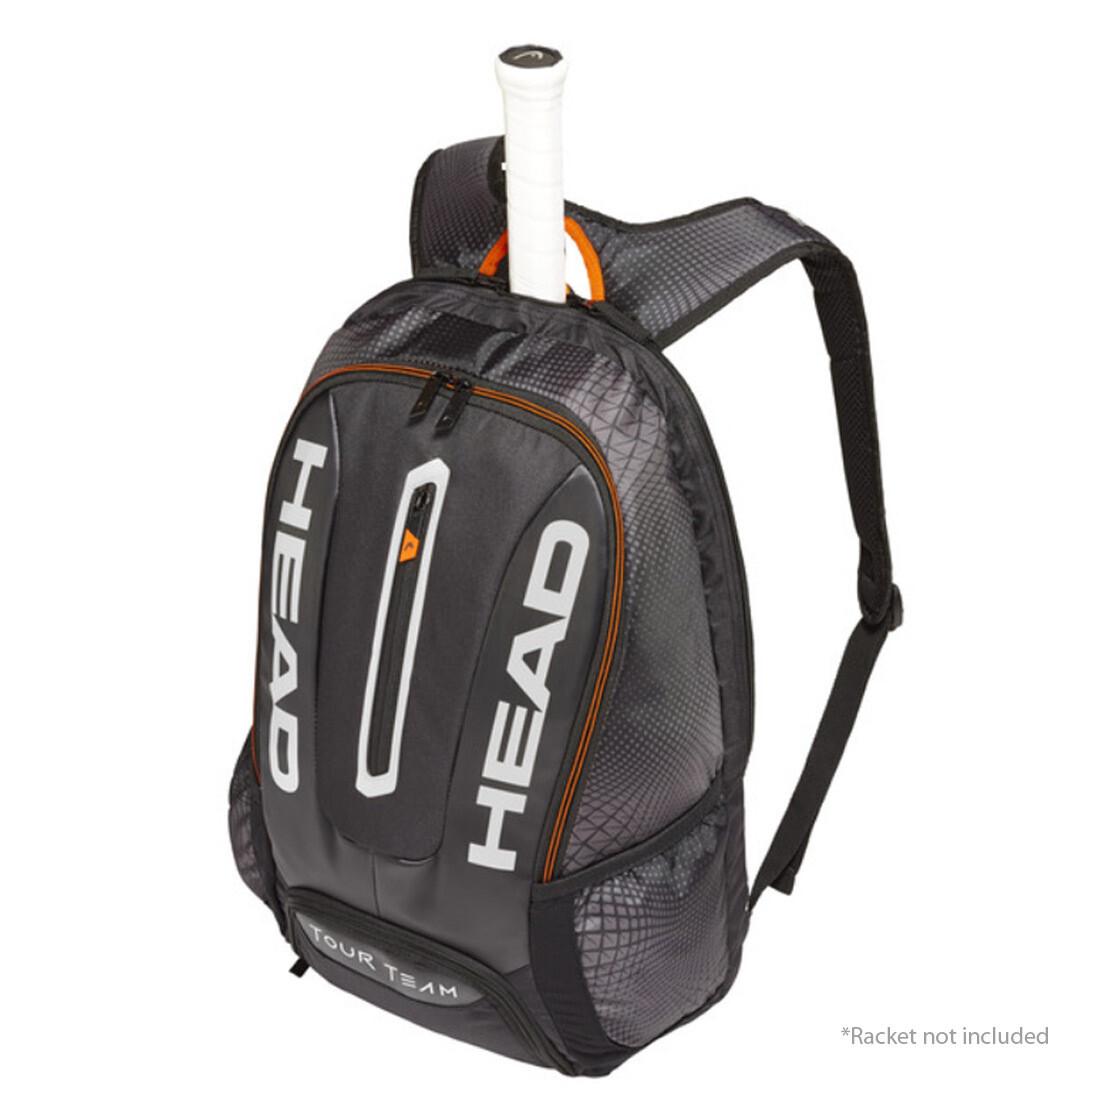 Head Tour Team Backpack - Black